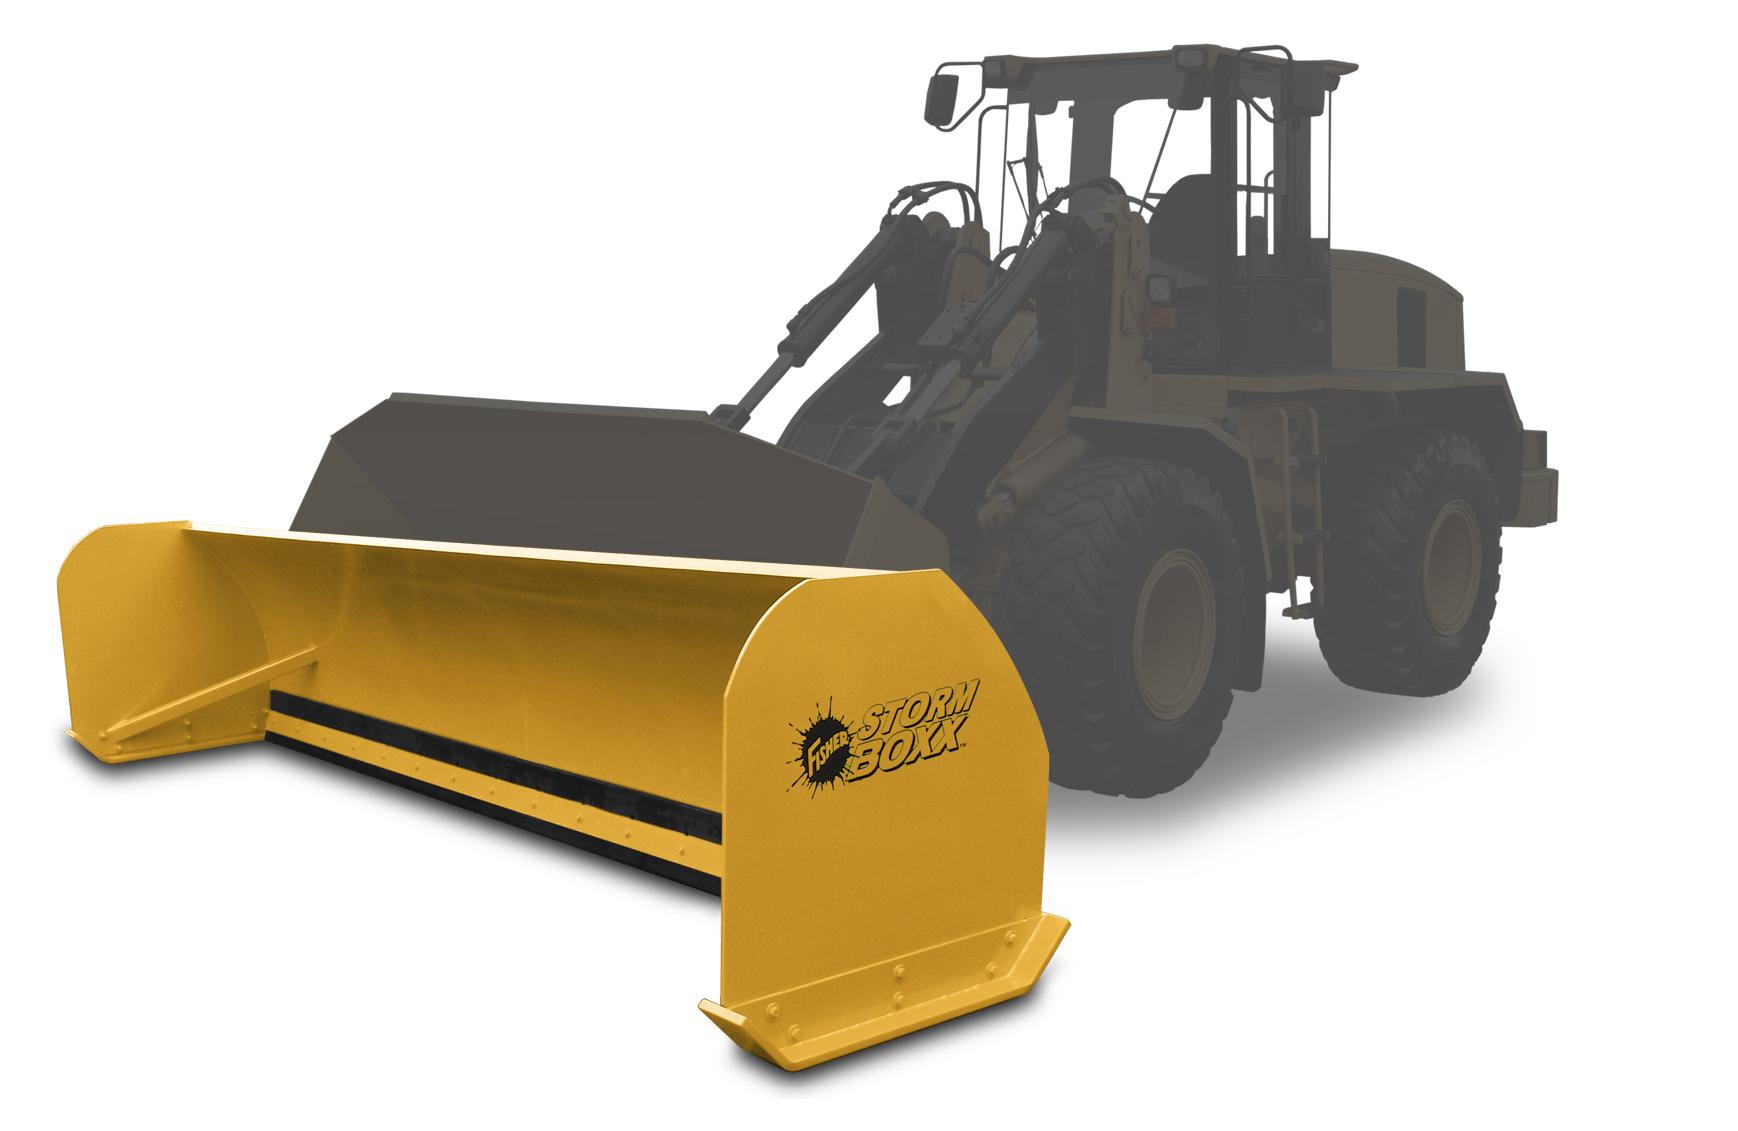 fisher plow bulldog auto start wiring diagram storm boxx pusher plows nj snowplows western and